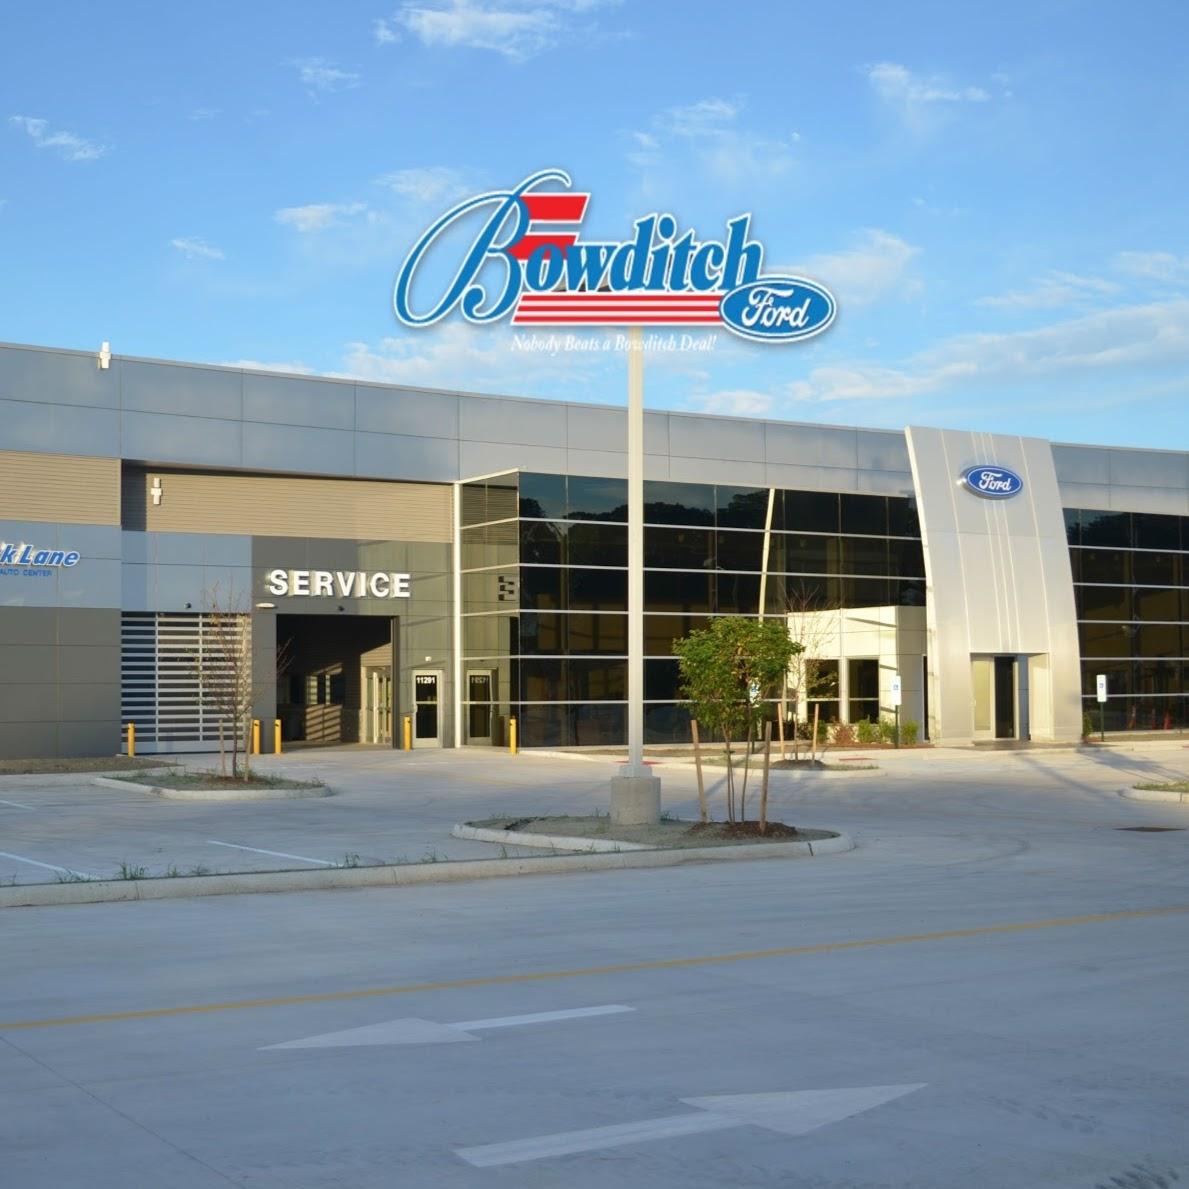 Bowditch Ford Newport News Virginia Va Localdatabase Com